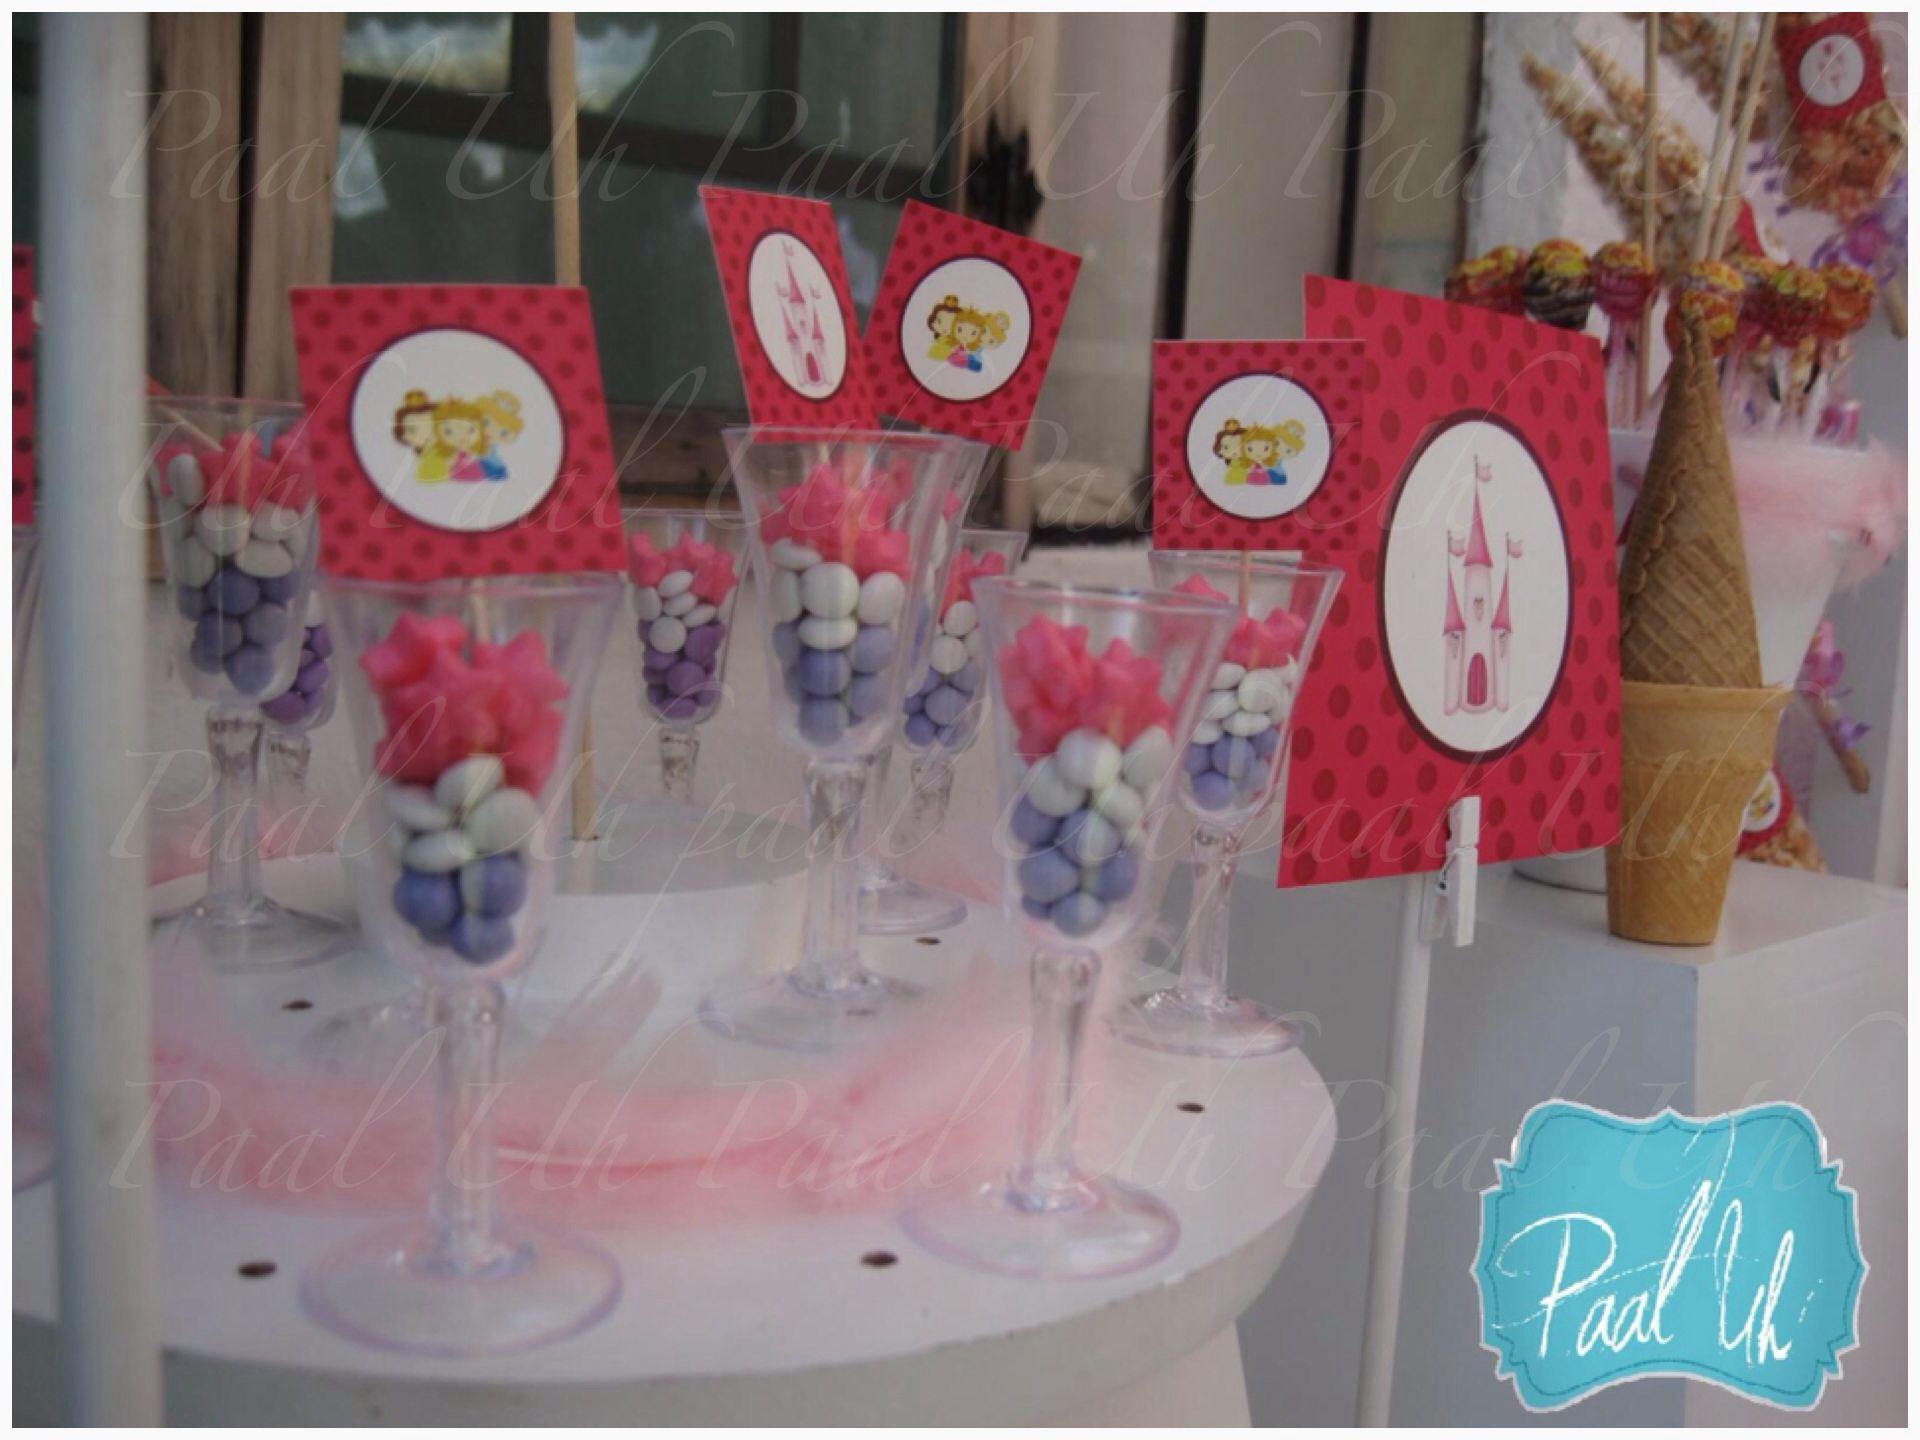 Paal Uh. Mesas de Postres & Snack's.  Aurora. Dulces Personalizados. Brochetas Frutales. Chamoy. Fiesta de Princesas. La Bella Durmiente. Rosa. Candy Bar / Table / party girl / princess / Sleeping Beauty / Sweet / Buffet /